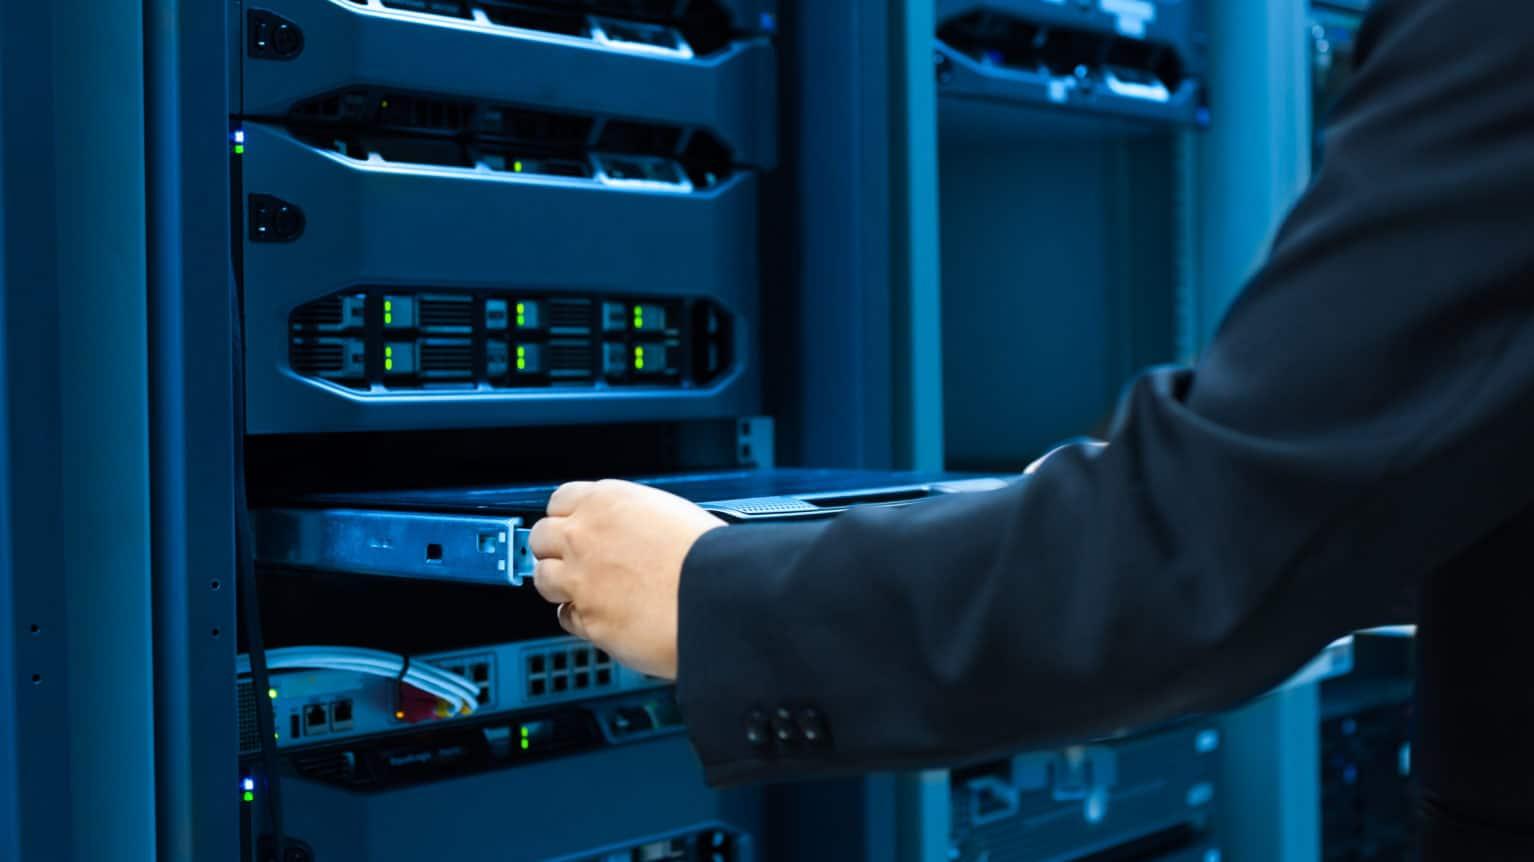 Man fixes server network in data center room